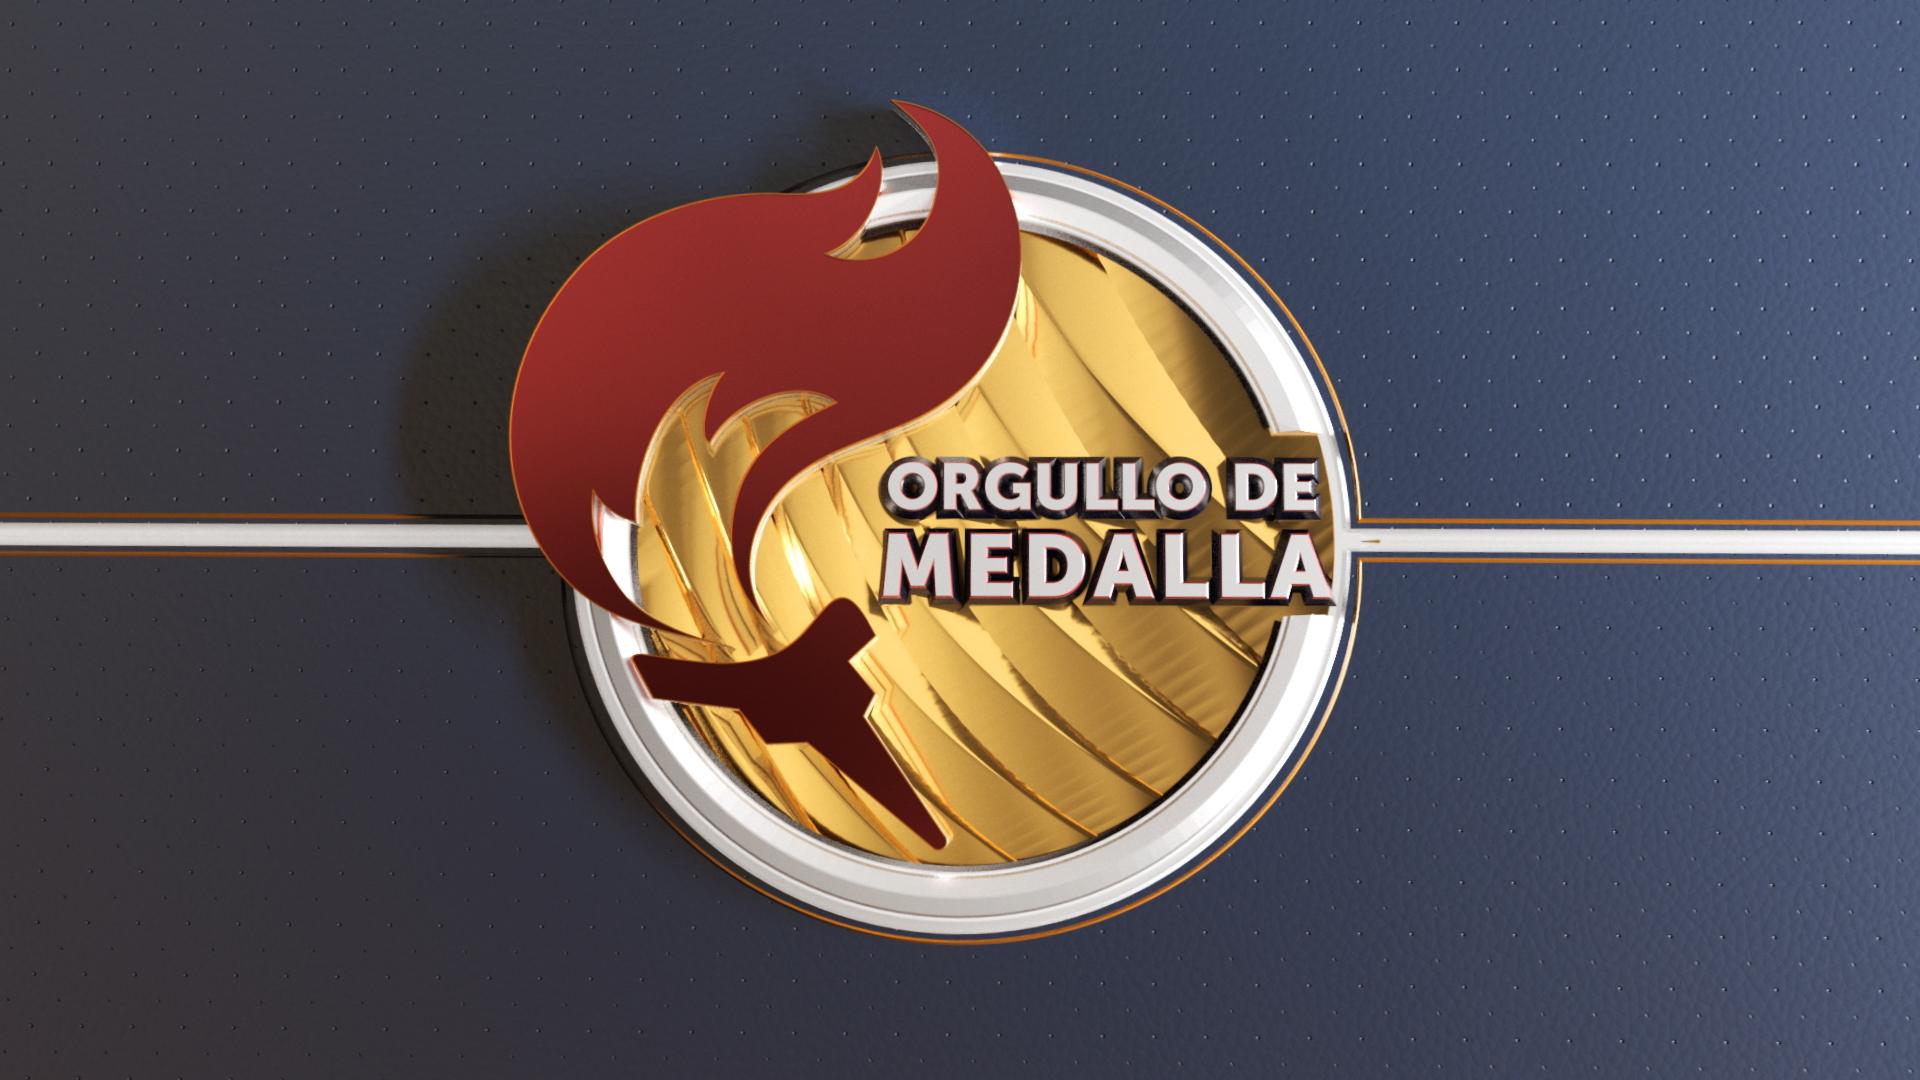 branding-cabecera-orgullo-de-medalla-olimpiadas-5-rtve-1920x1080-1.jpg